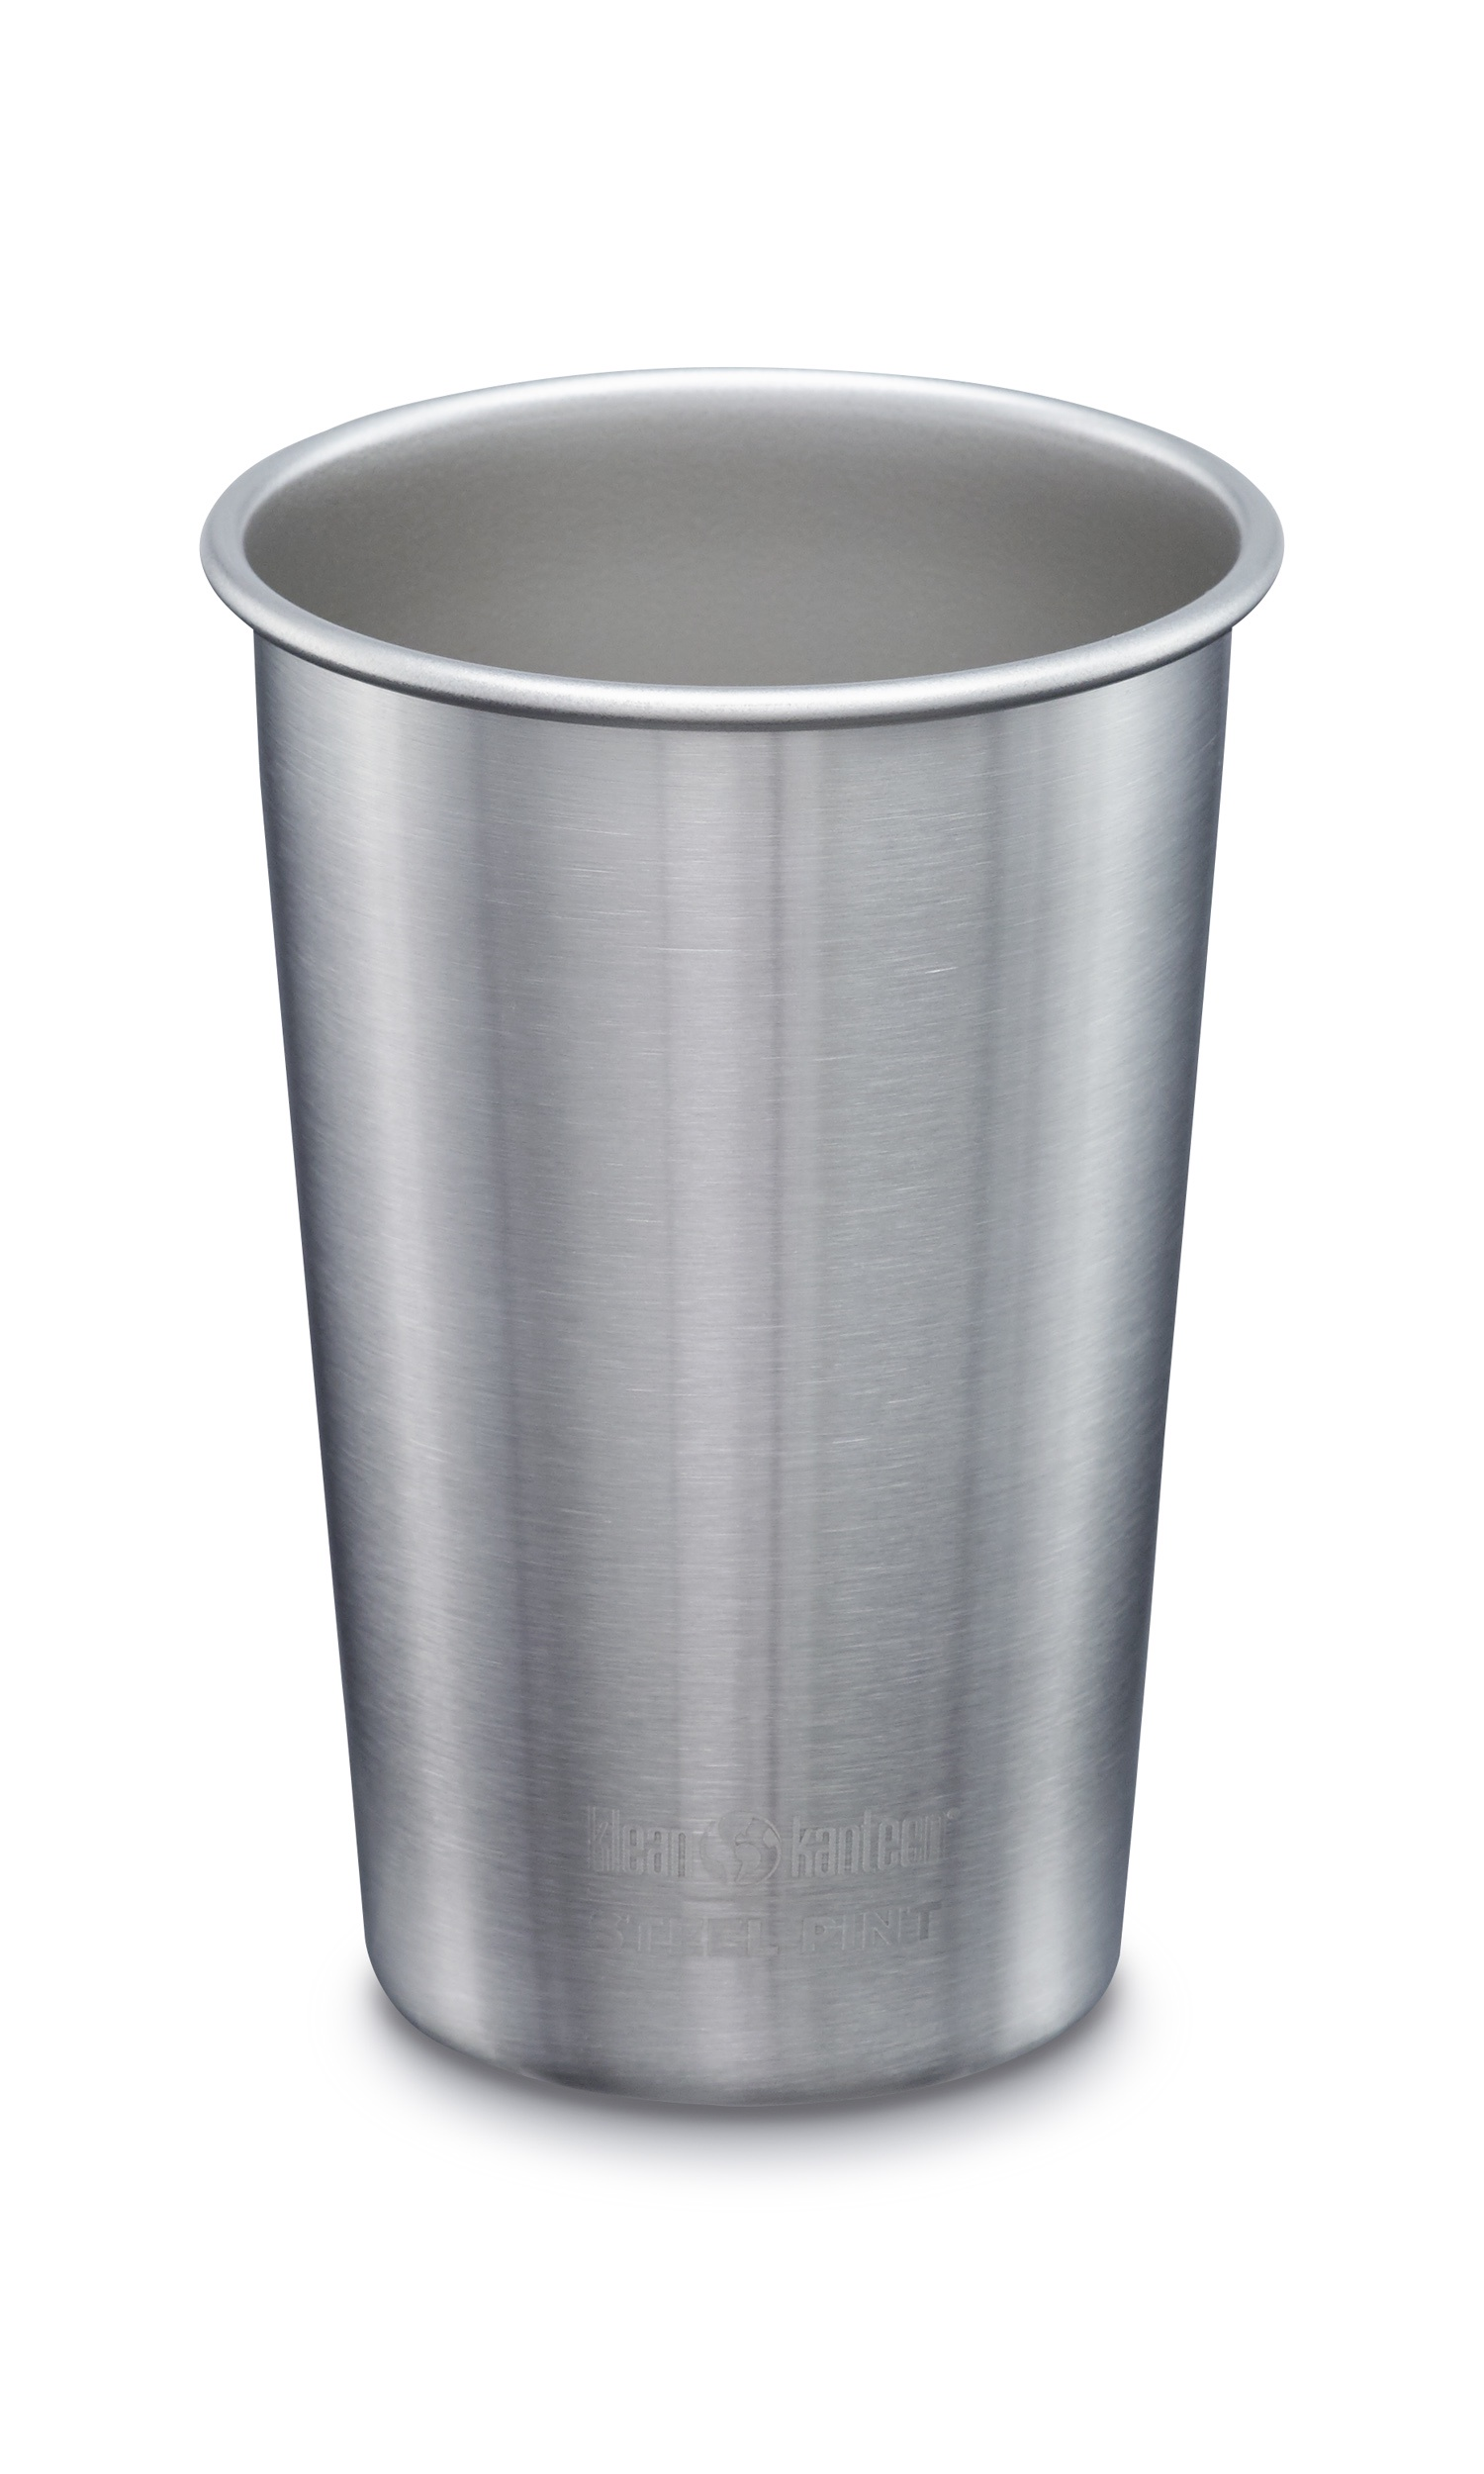 Стакан походный Klean Kanteen 1000425, серебристый dysprosium metal 99 9% 5 grams 0 176 oz